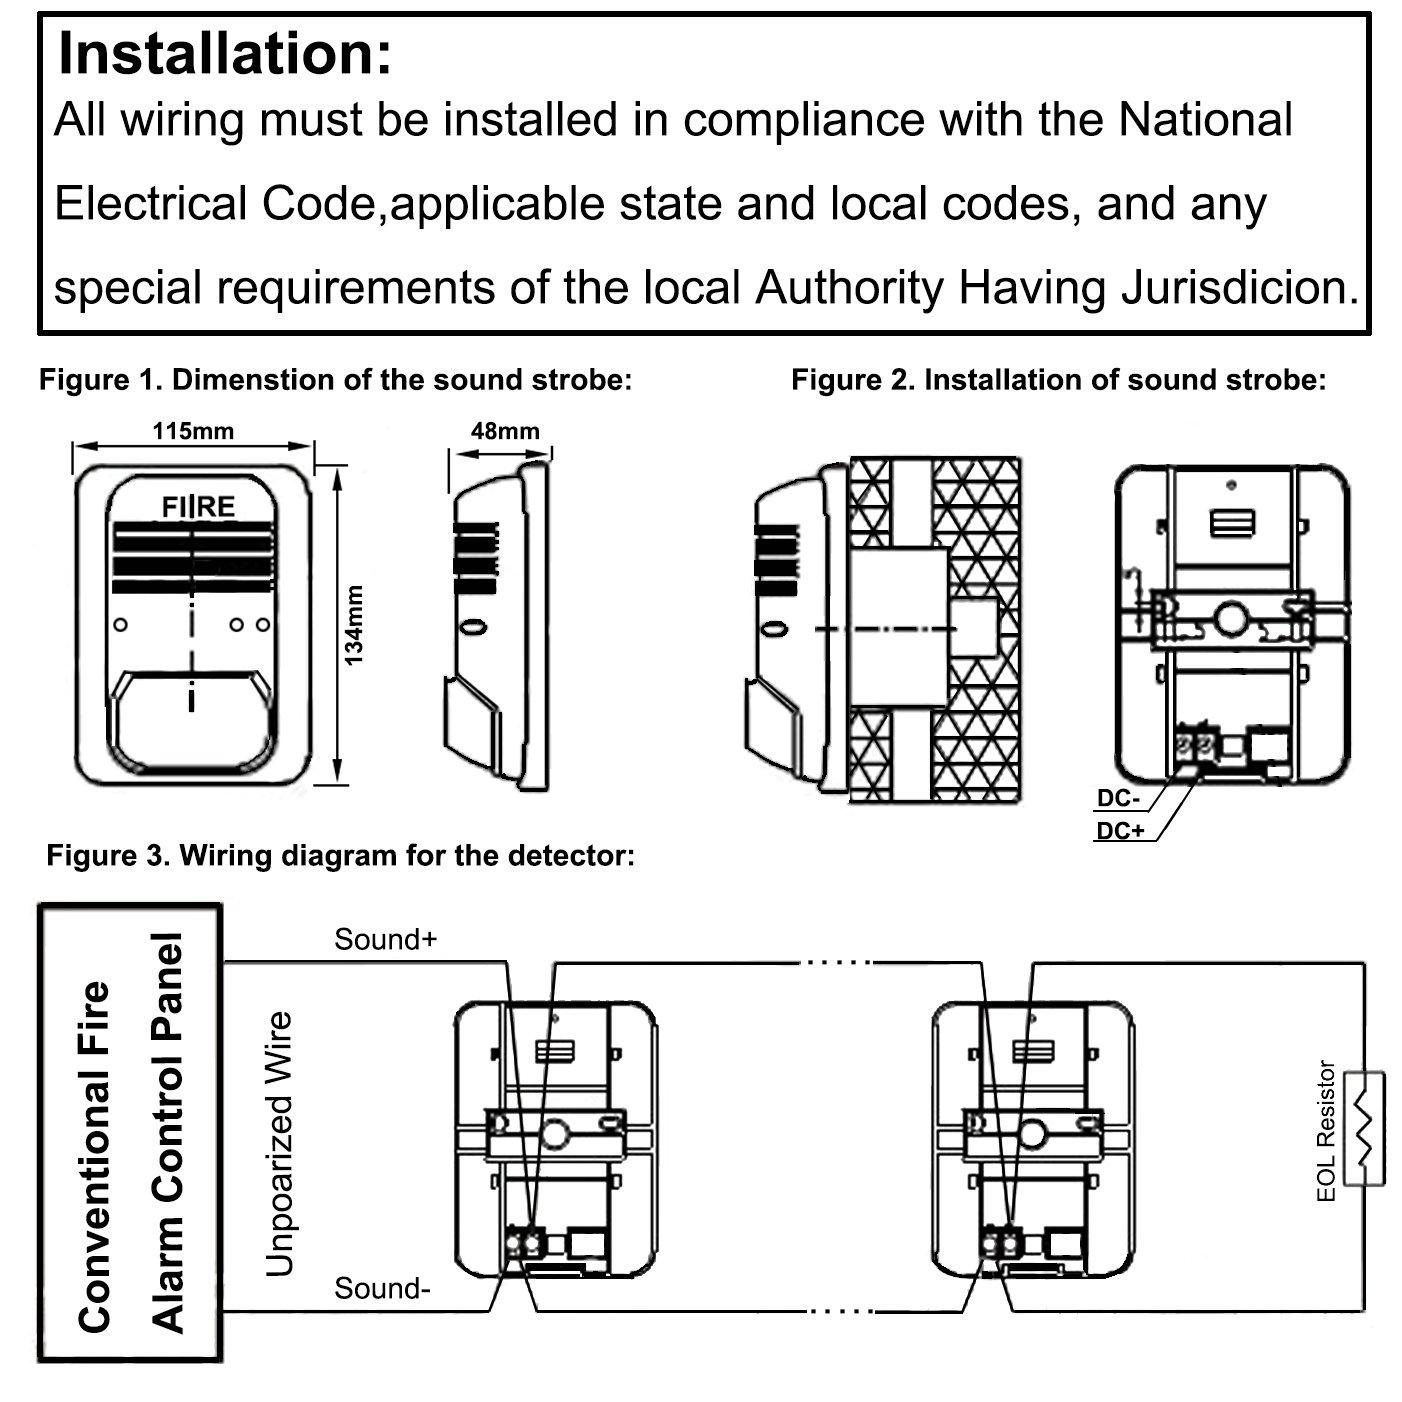 Fire Alarm System Wiring Diagram Addressable Fire Alarm System